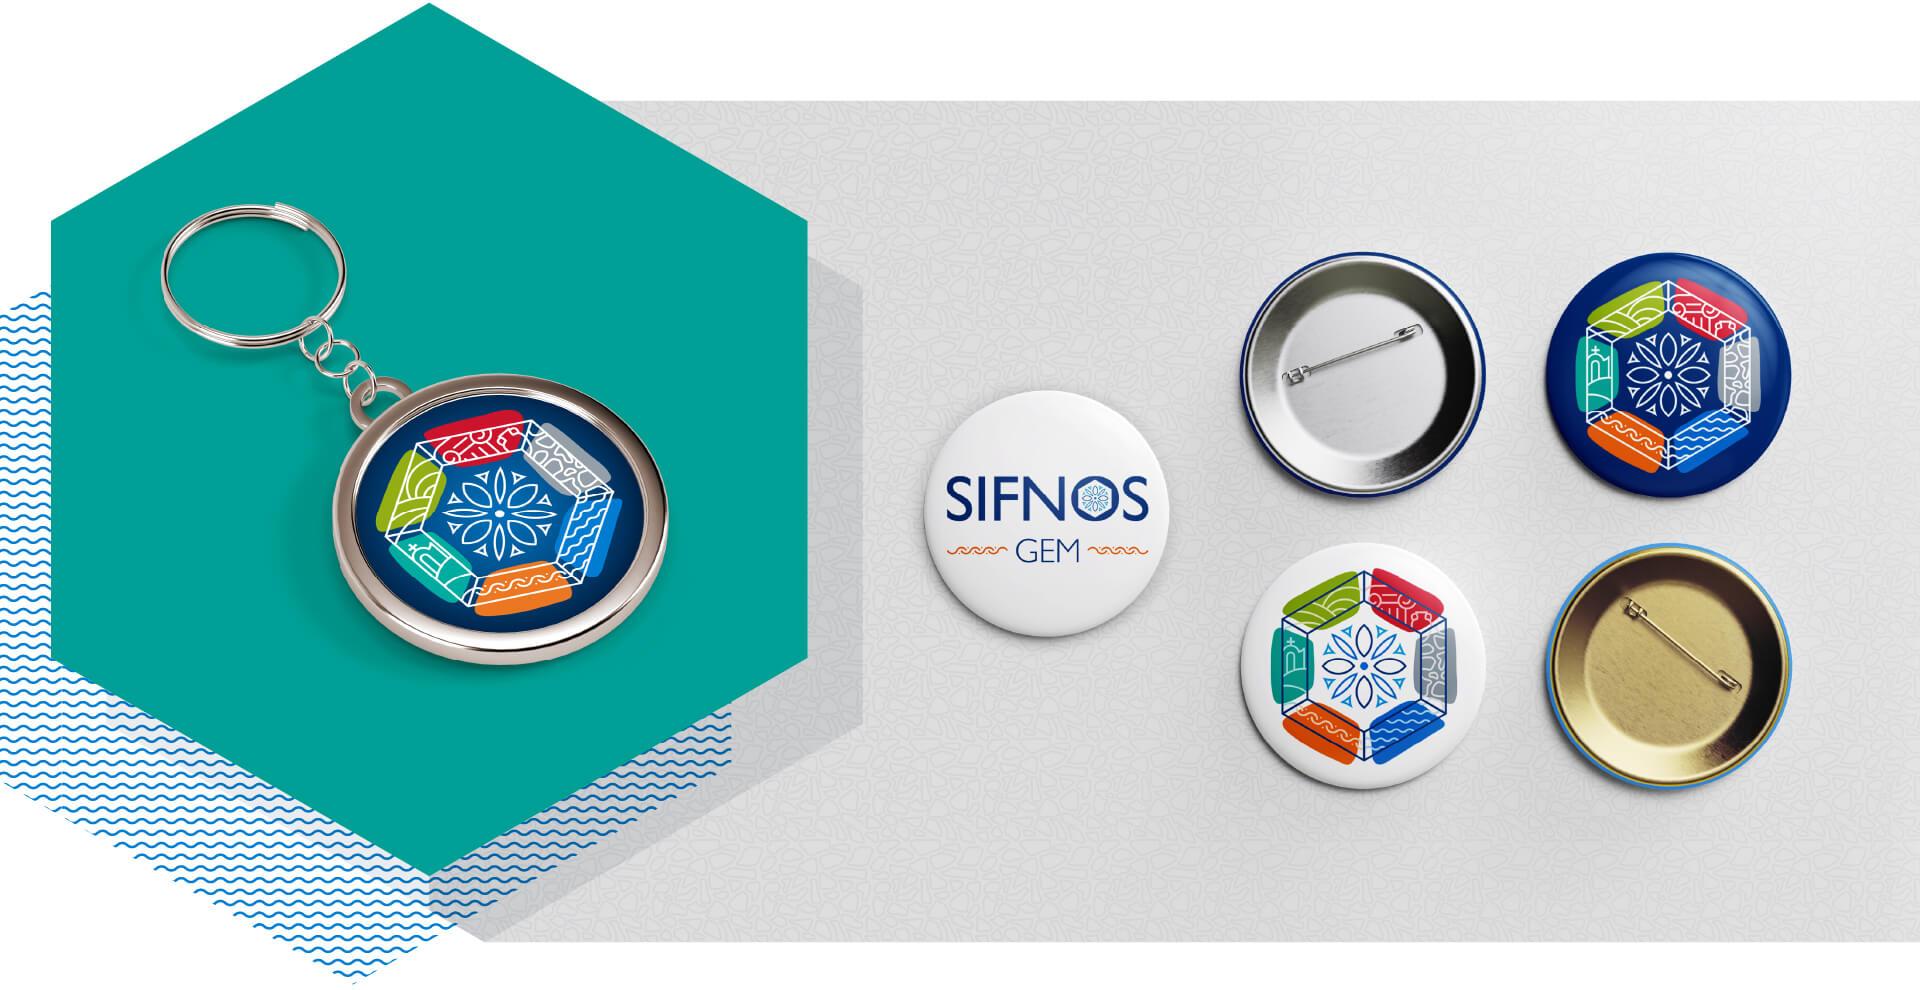 18-Sifnos-Rebranding-2021